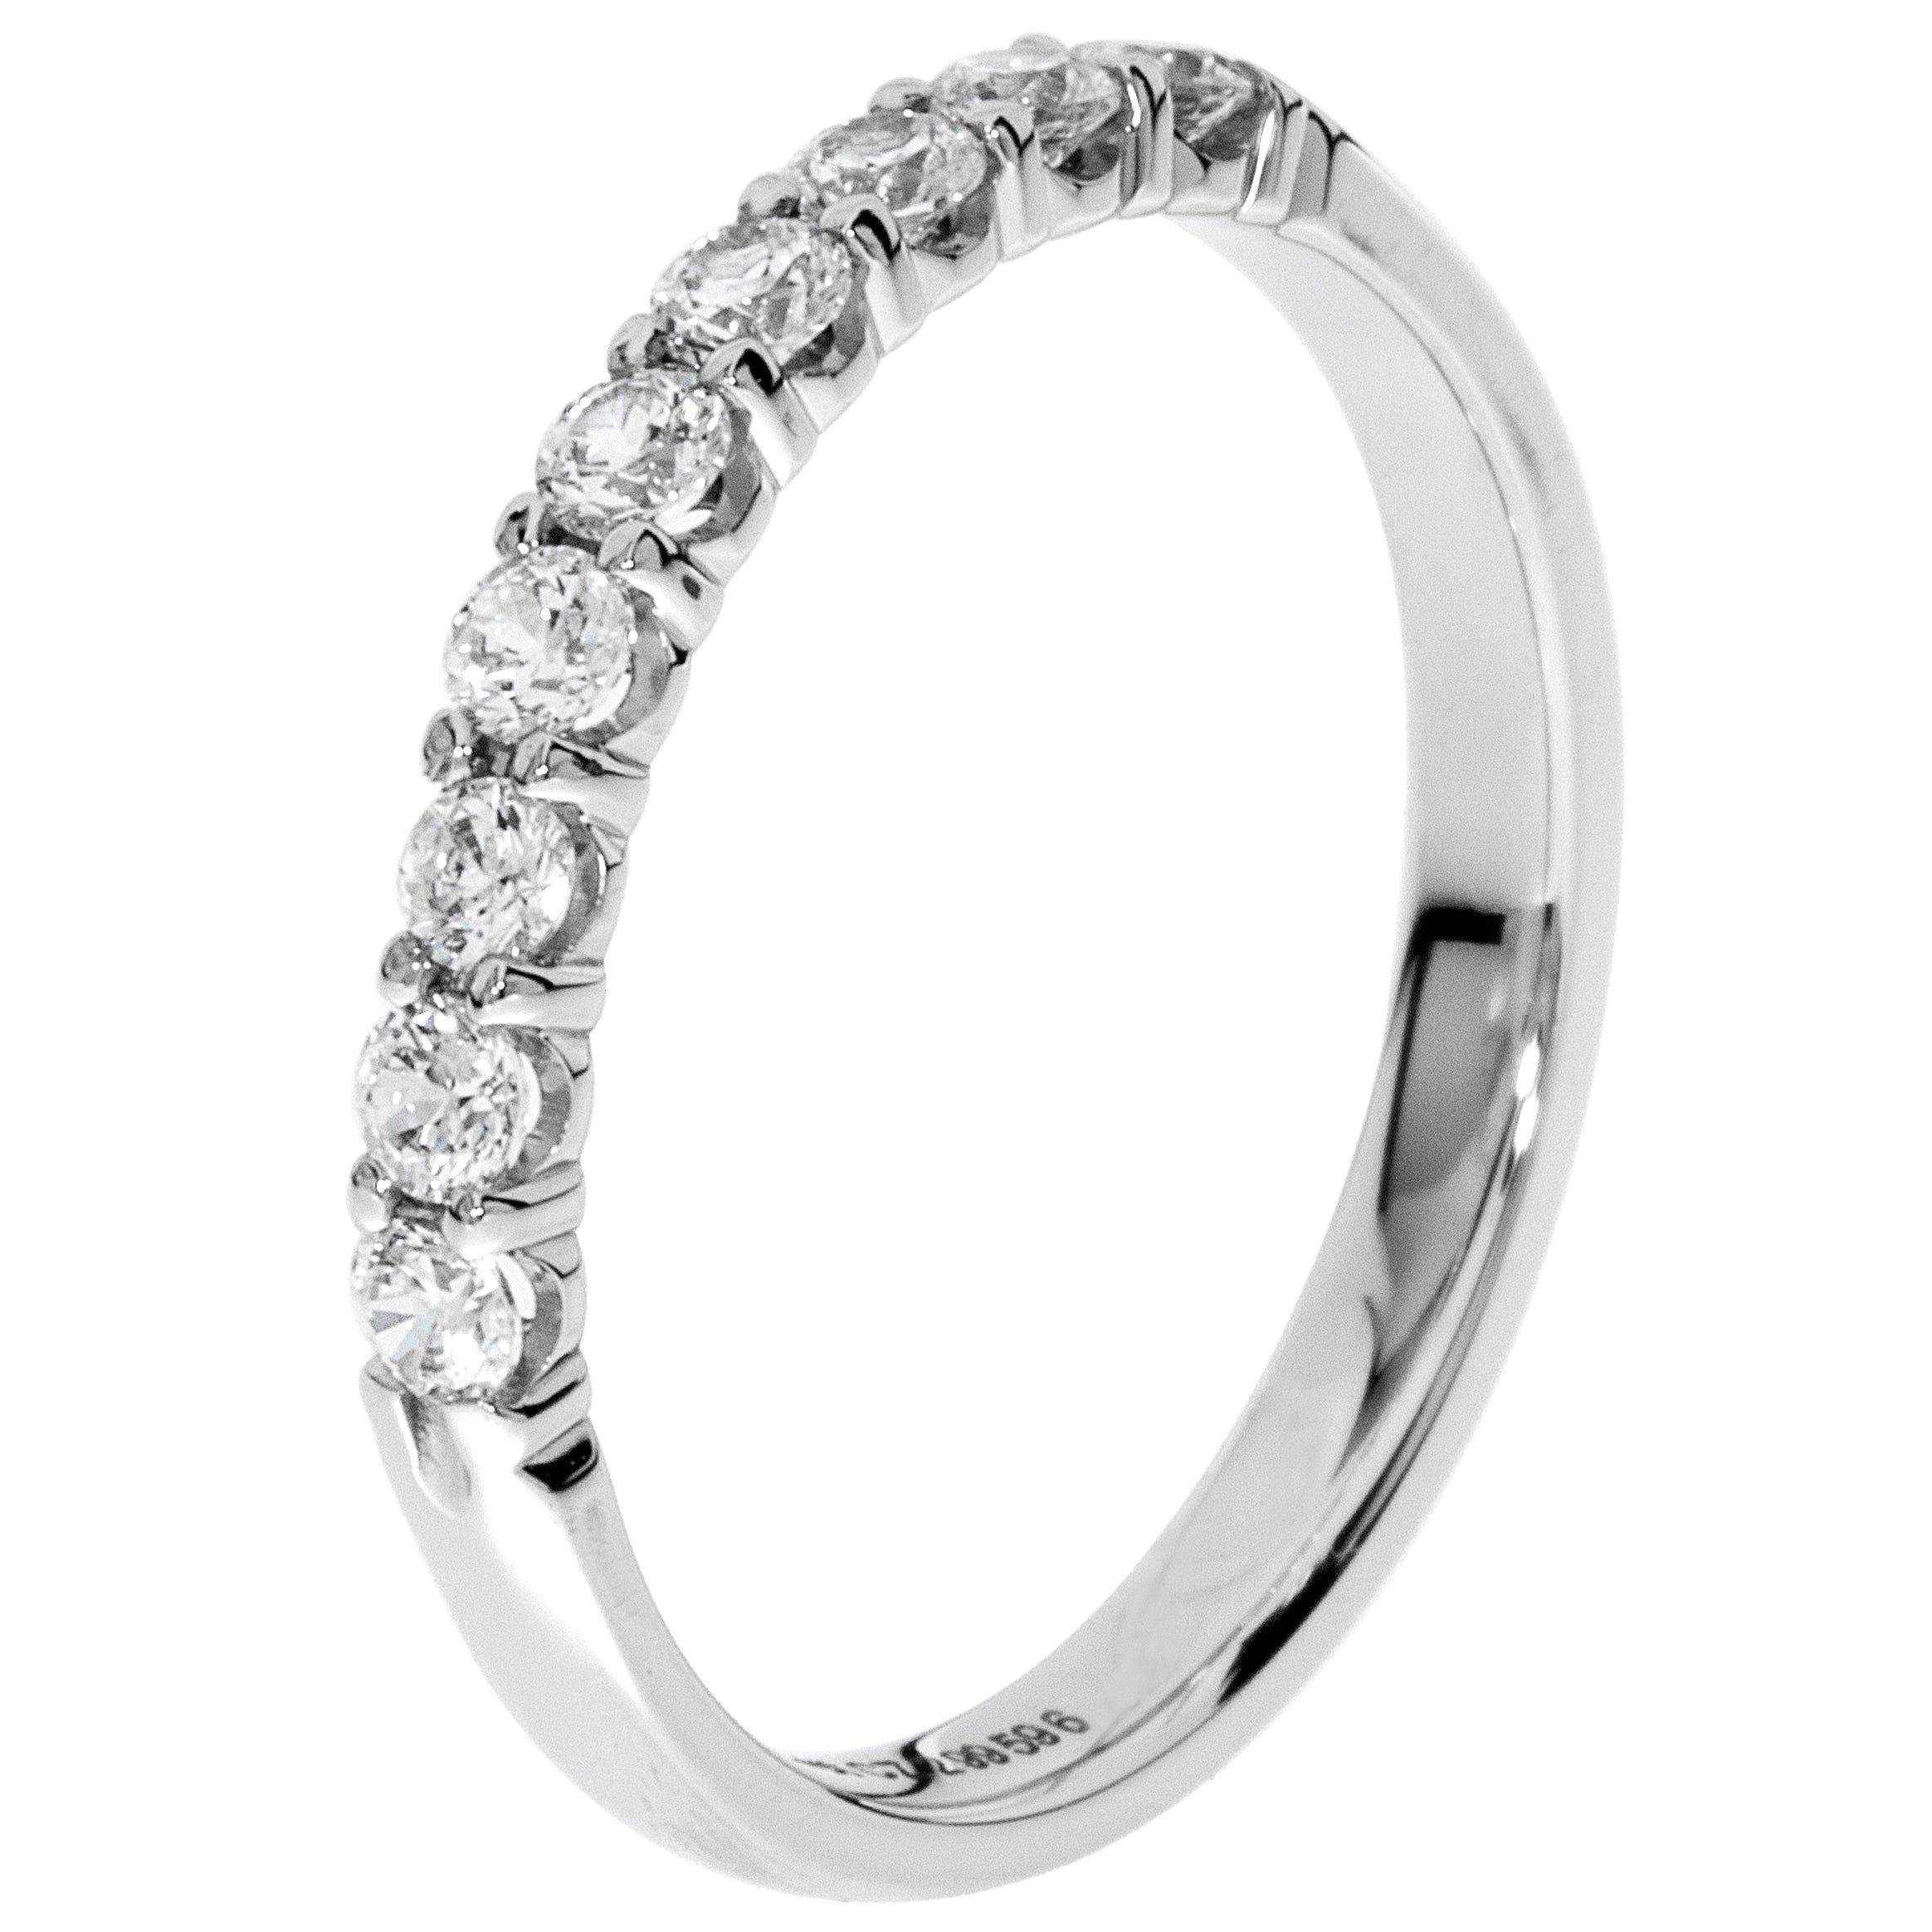 9-Stone Diamond Band 1/3 ctw. (H-I, I1-2) 10k White Gold